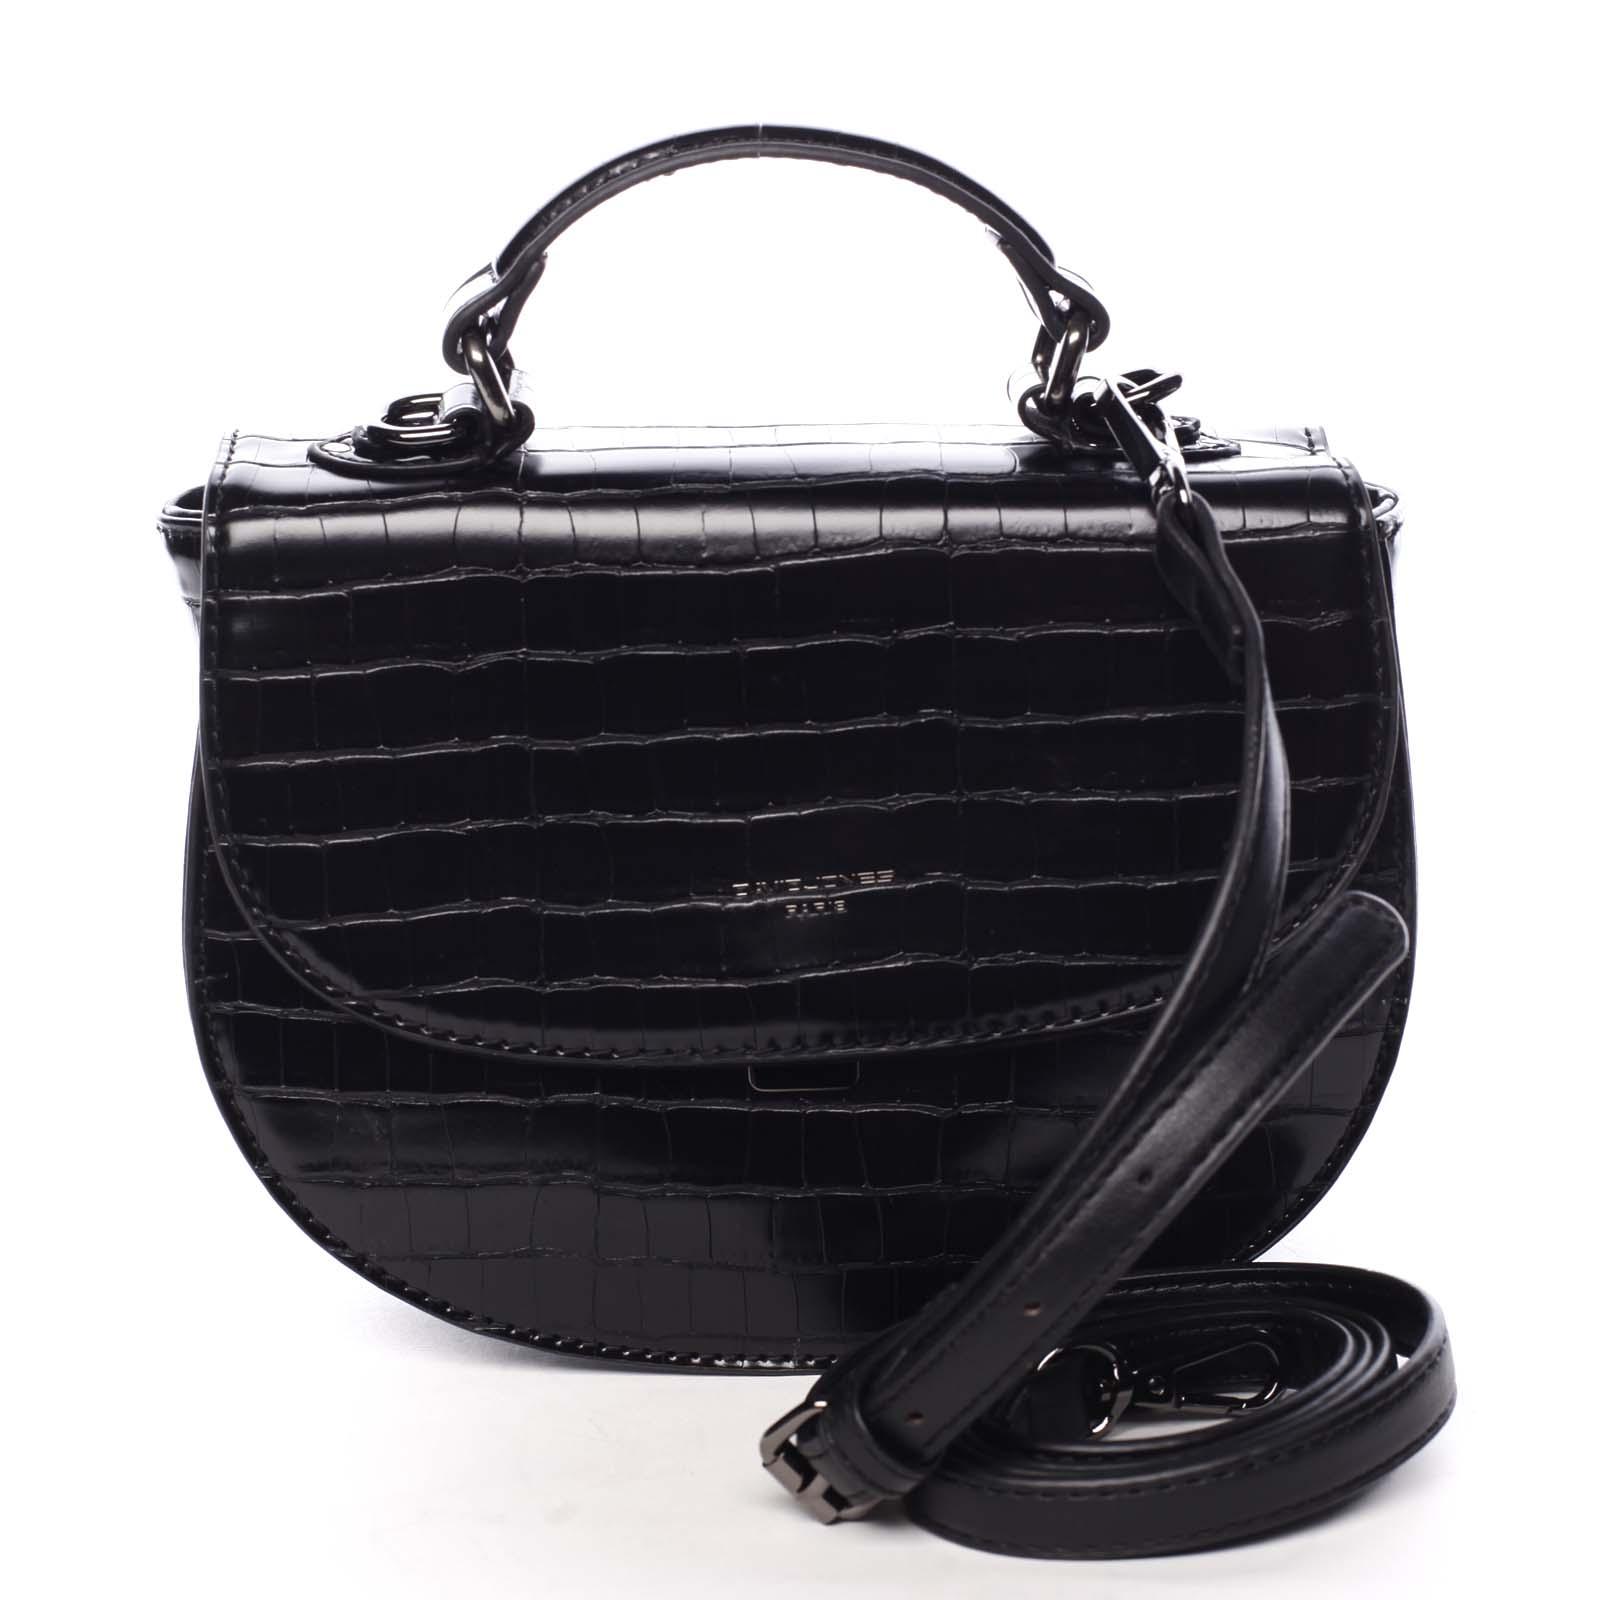 Dámska kabelka do ruky čierna - David Jones Cosette